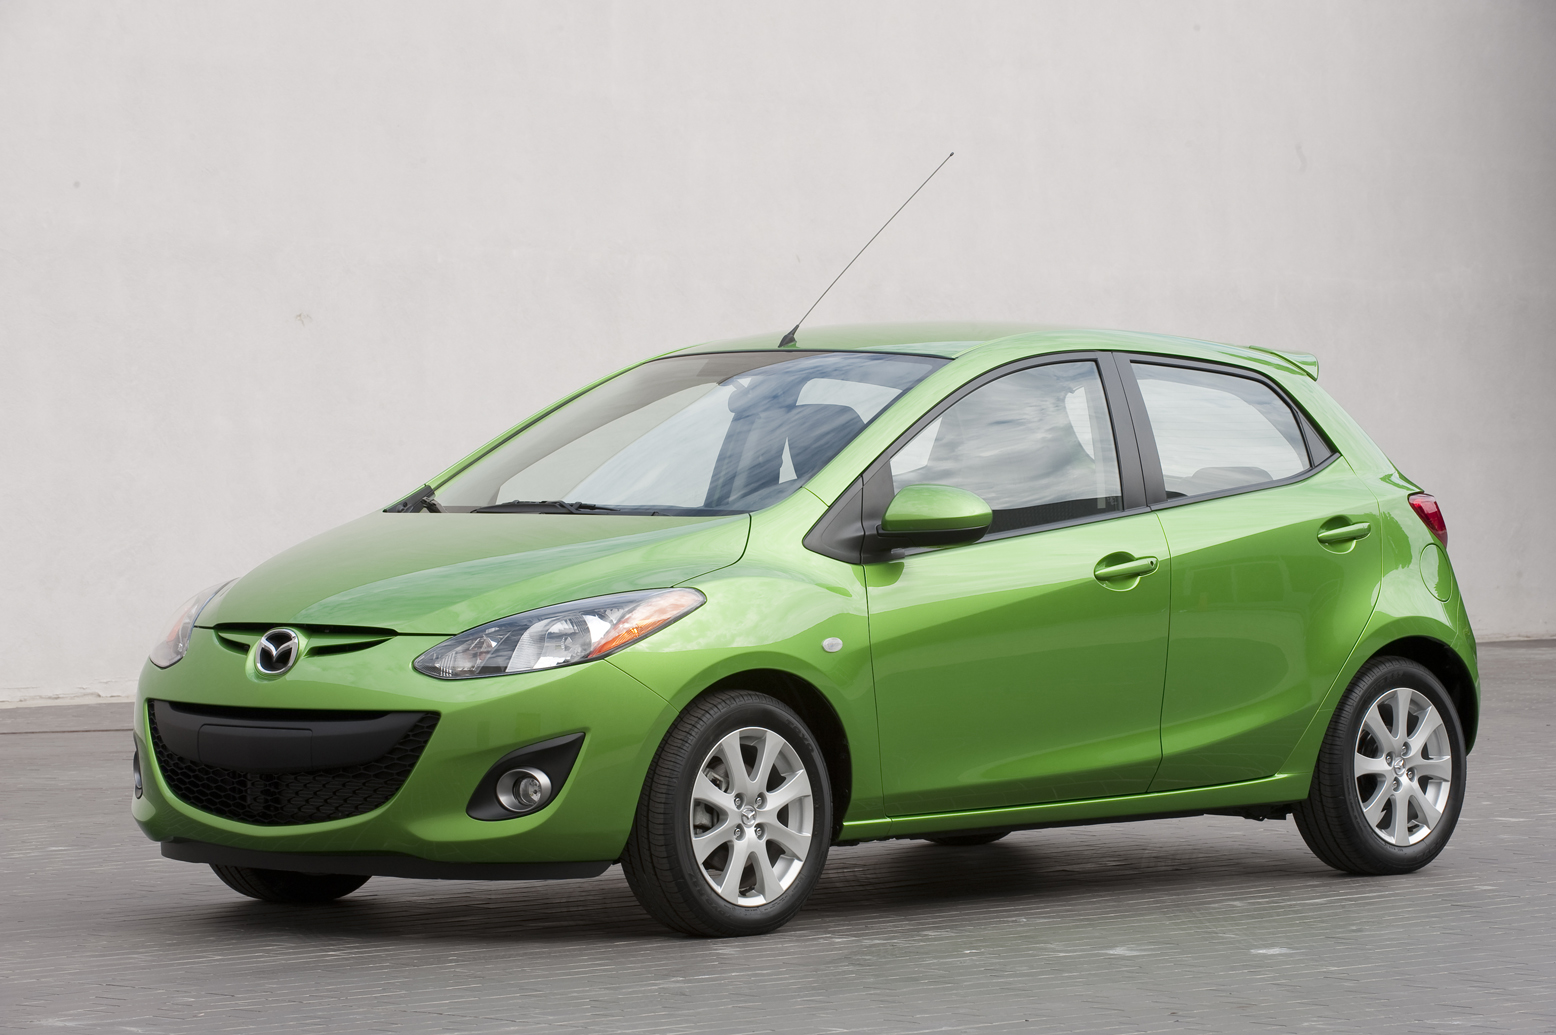 http://4.bp.blogspot.com/-49z4t-J9ysc/TaxJ2yyTLrI/AAAAAAAAAno/6cZdDtpCjJc/s1600/2011+Mazda2.jpg